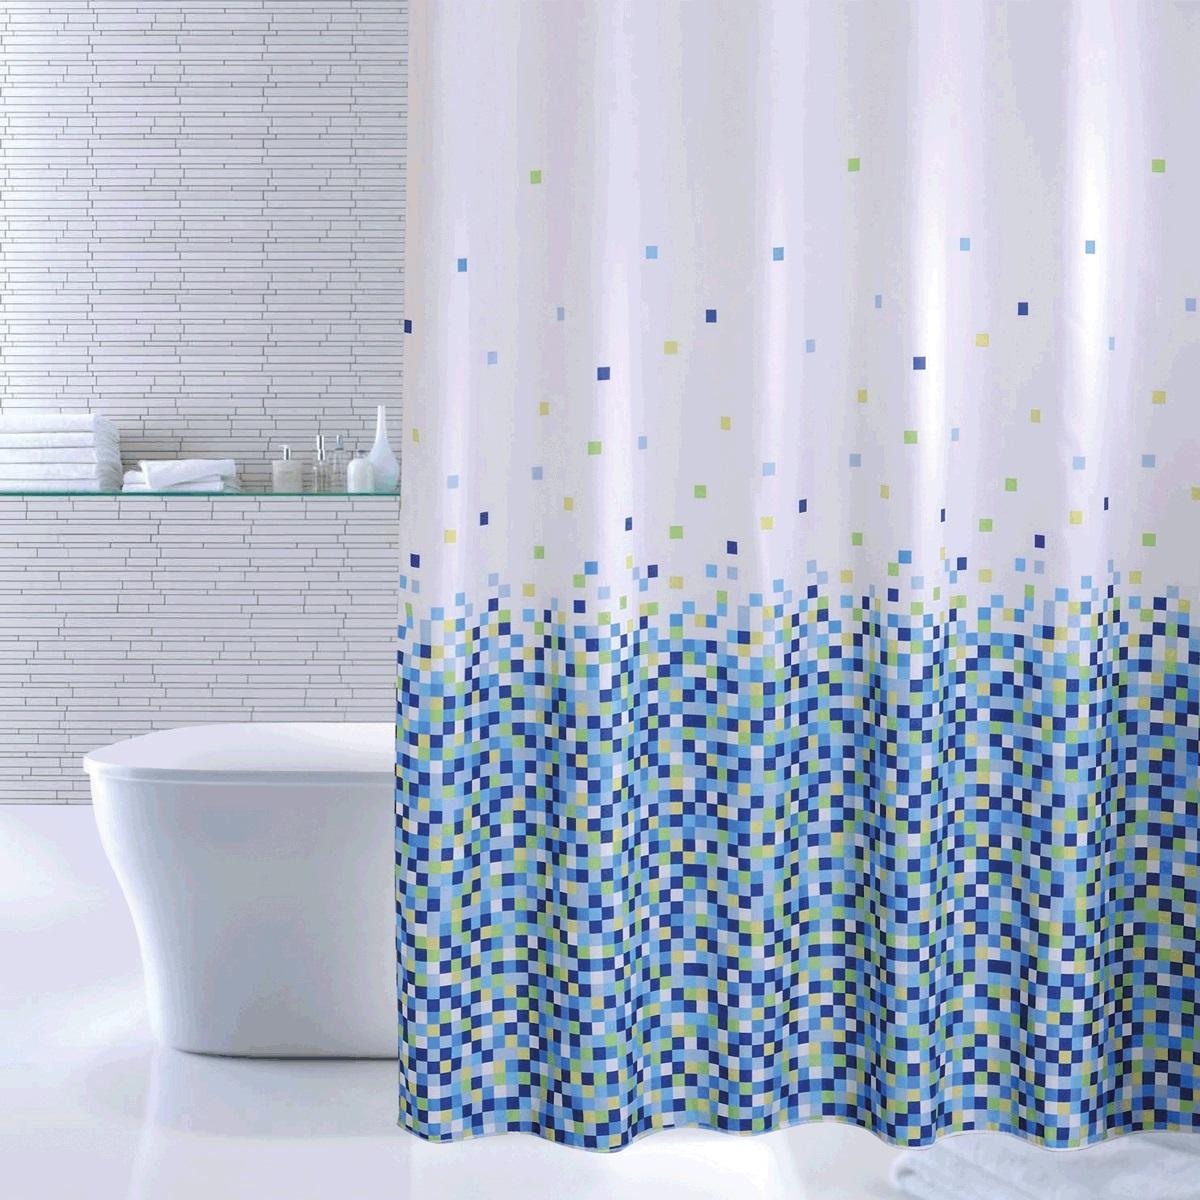 Штора для ванной Iddis Blue Pixels, цвет: синий, 180 x 200 см штора для ванной iddis blue butterfly цвет голубой 200 x 200 см